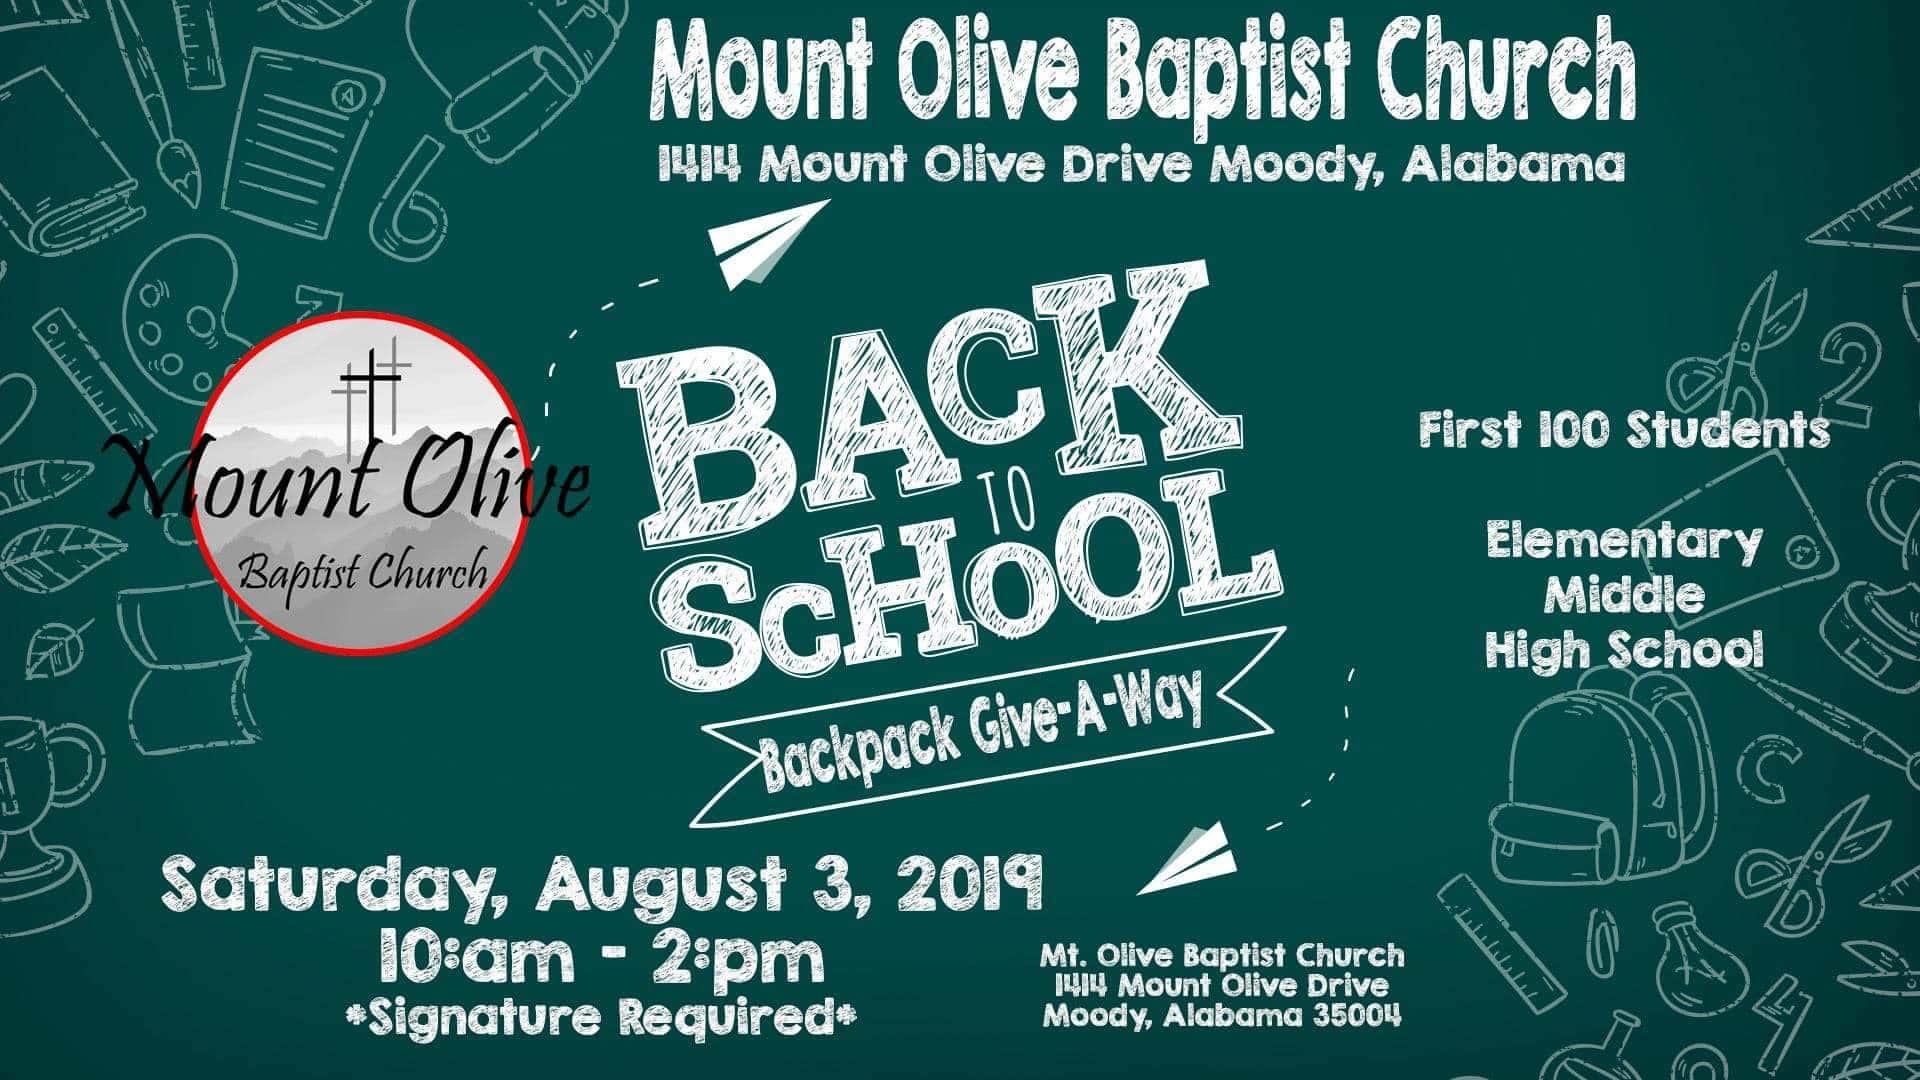 Mt  Olive Baptist Church   WAGG   610 WAGG